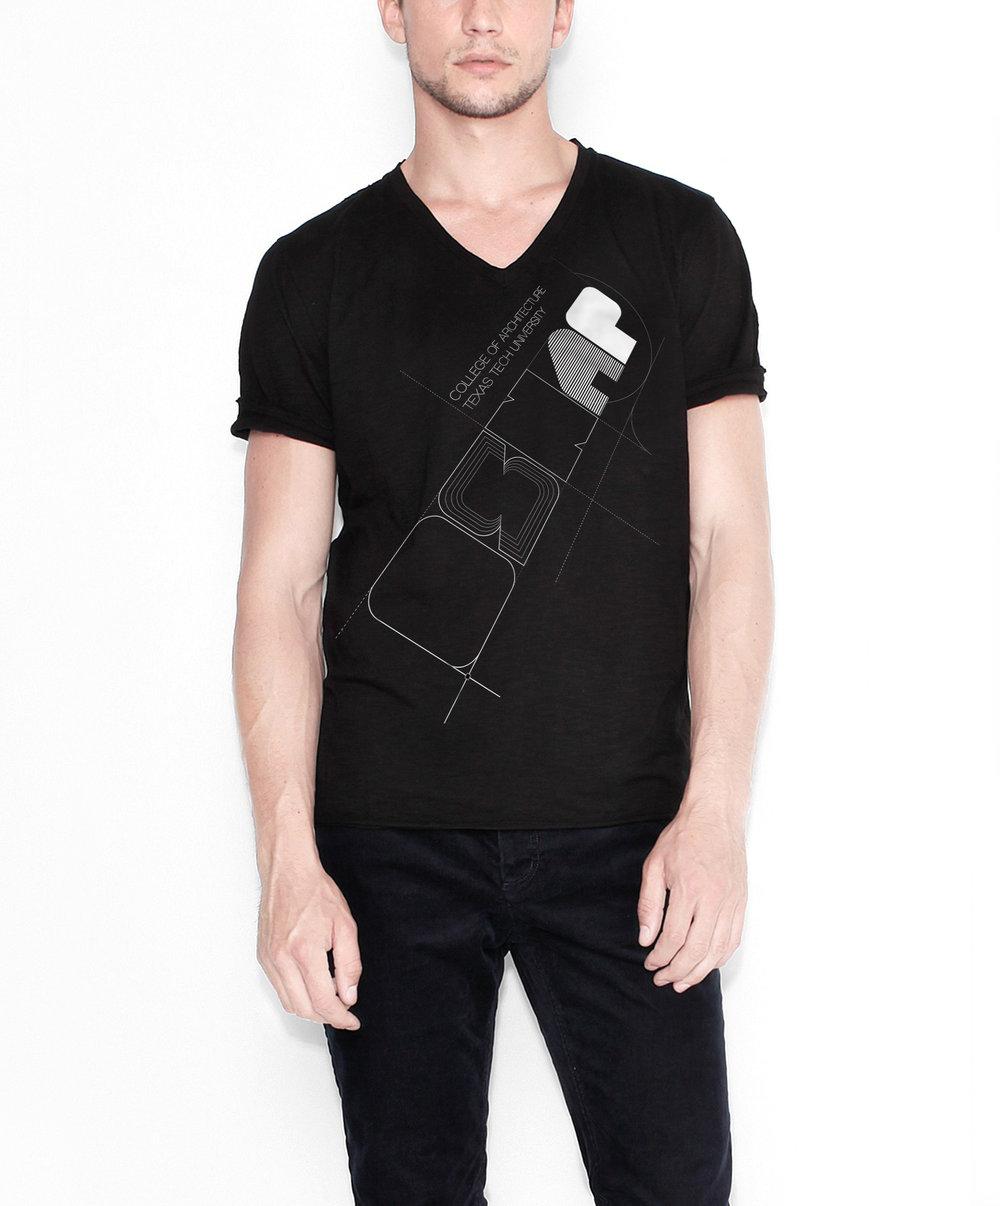 (1/2) 2011 Official Texas Tech COA T-shirt -  Apparel Graphics